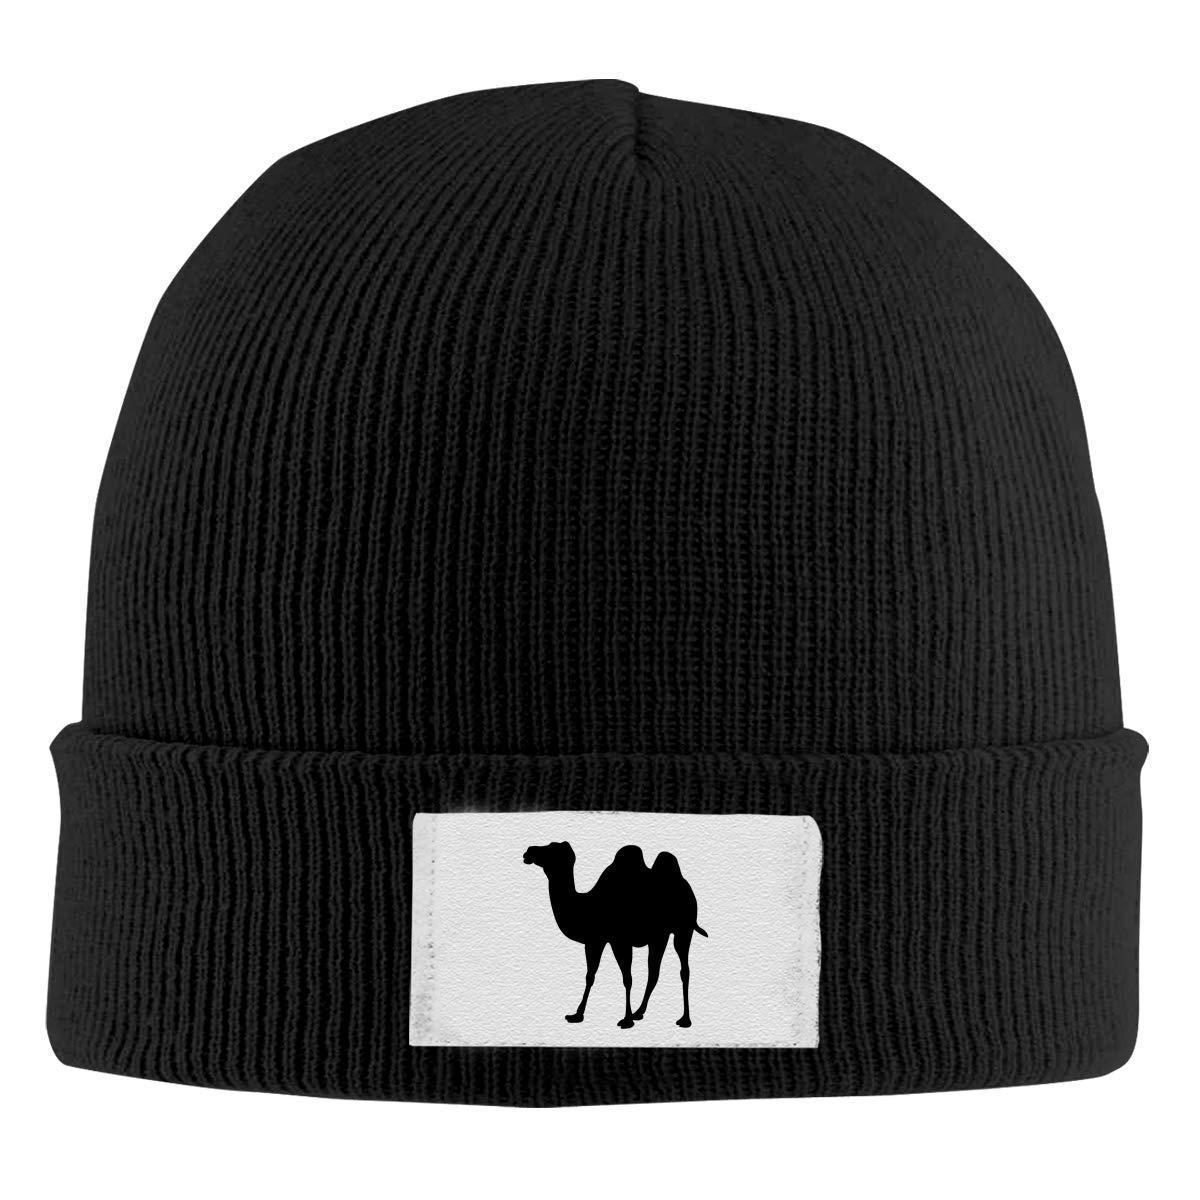 Stretchy Cuff Beanie Hat Black Dunpaiaa Skull Caps Camel Winter Warm Knit Hats